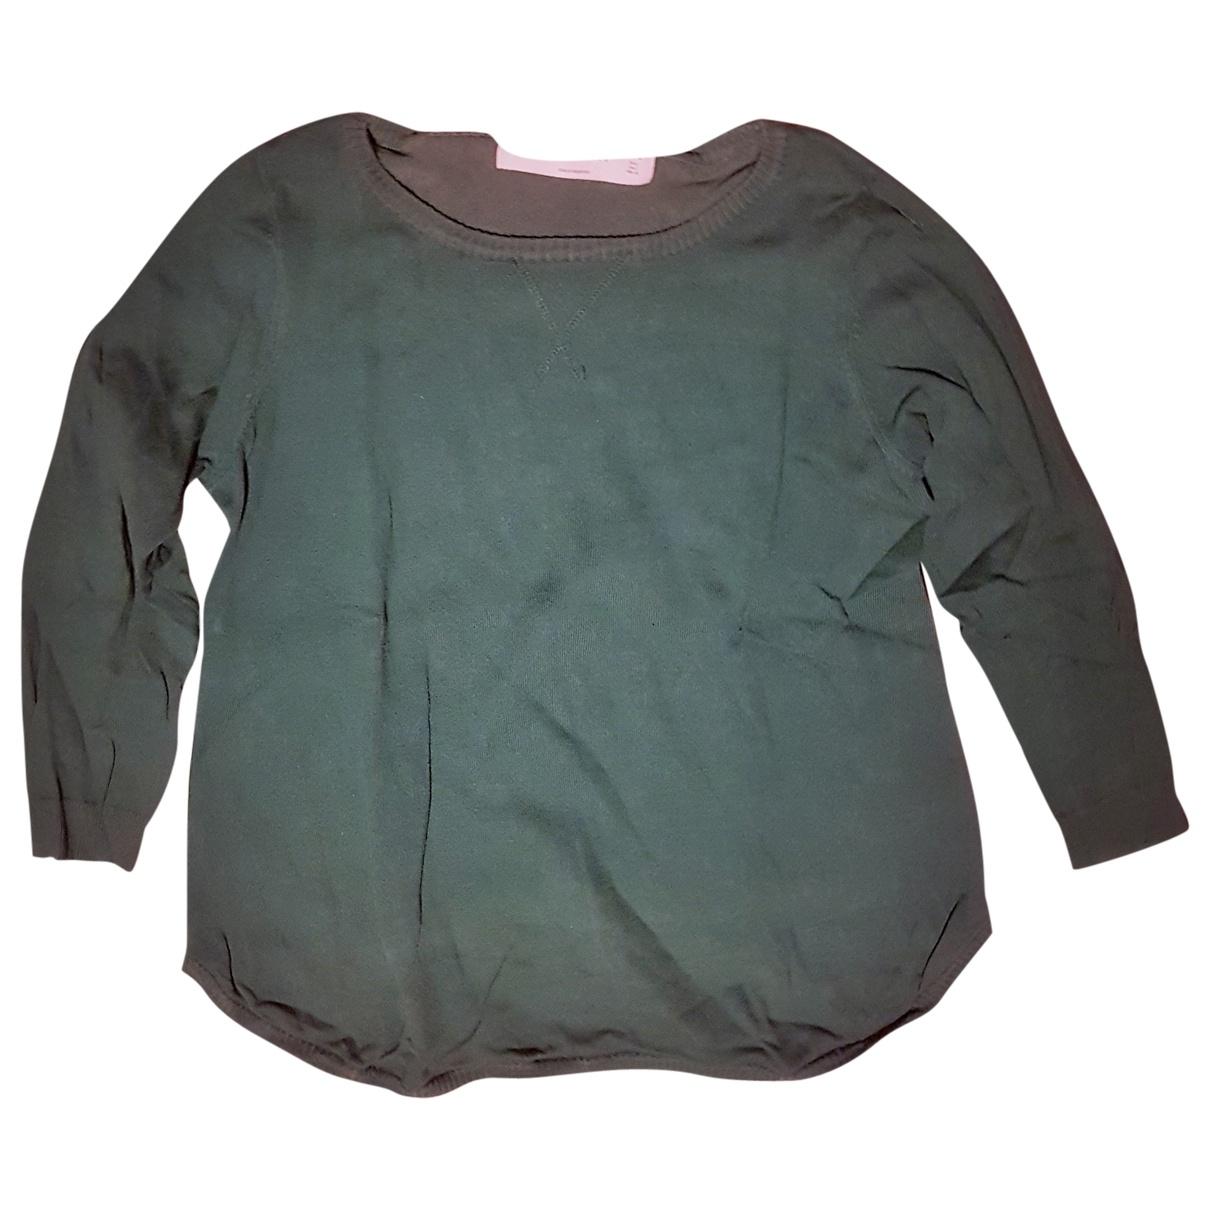 Zara \N Green Cotton jumpsuit for Women L International